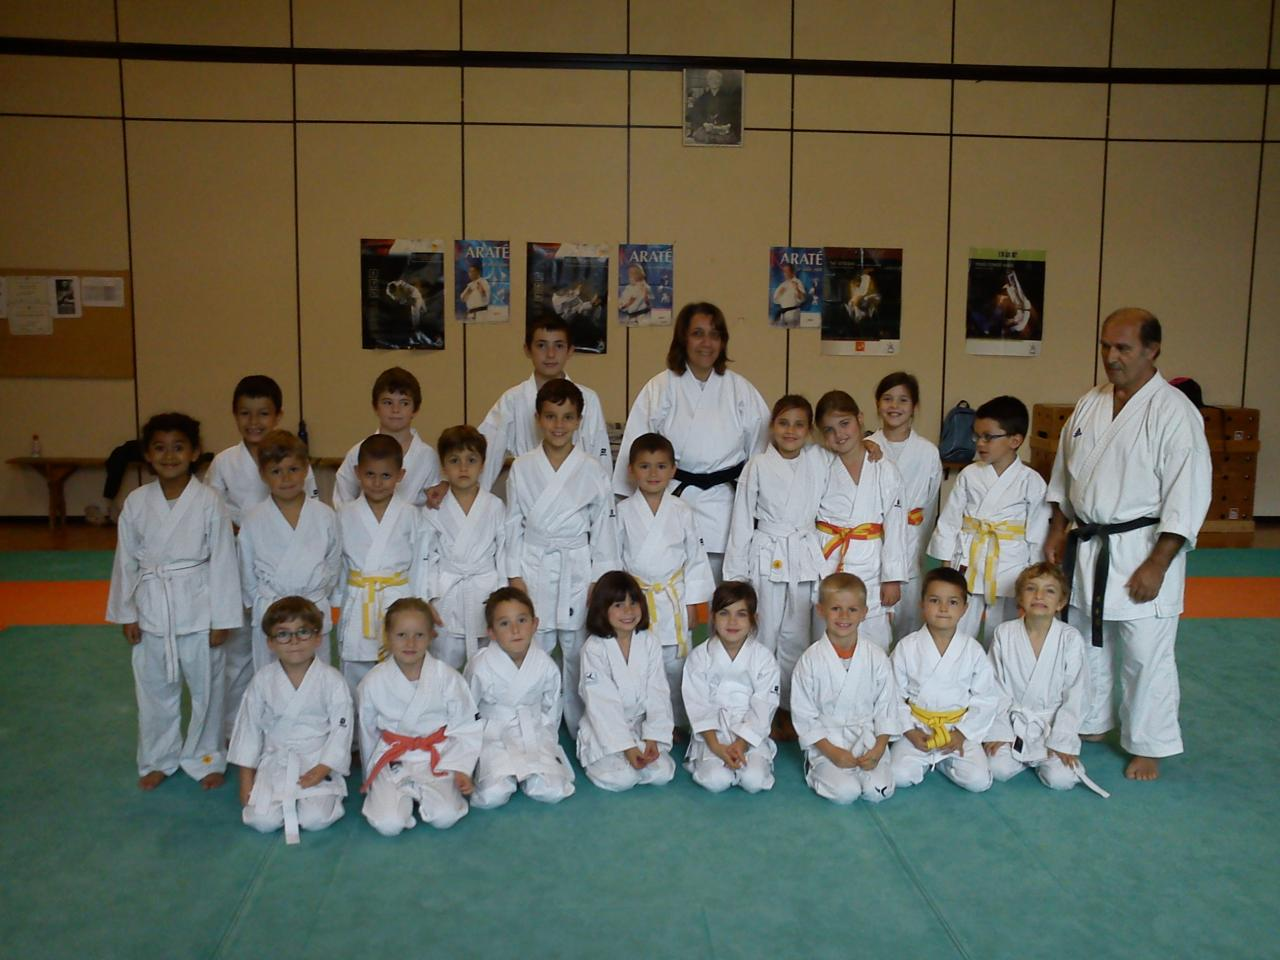 groupe+6-8 2012-2013